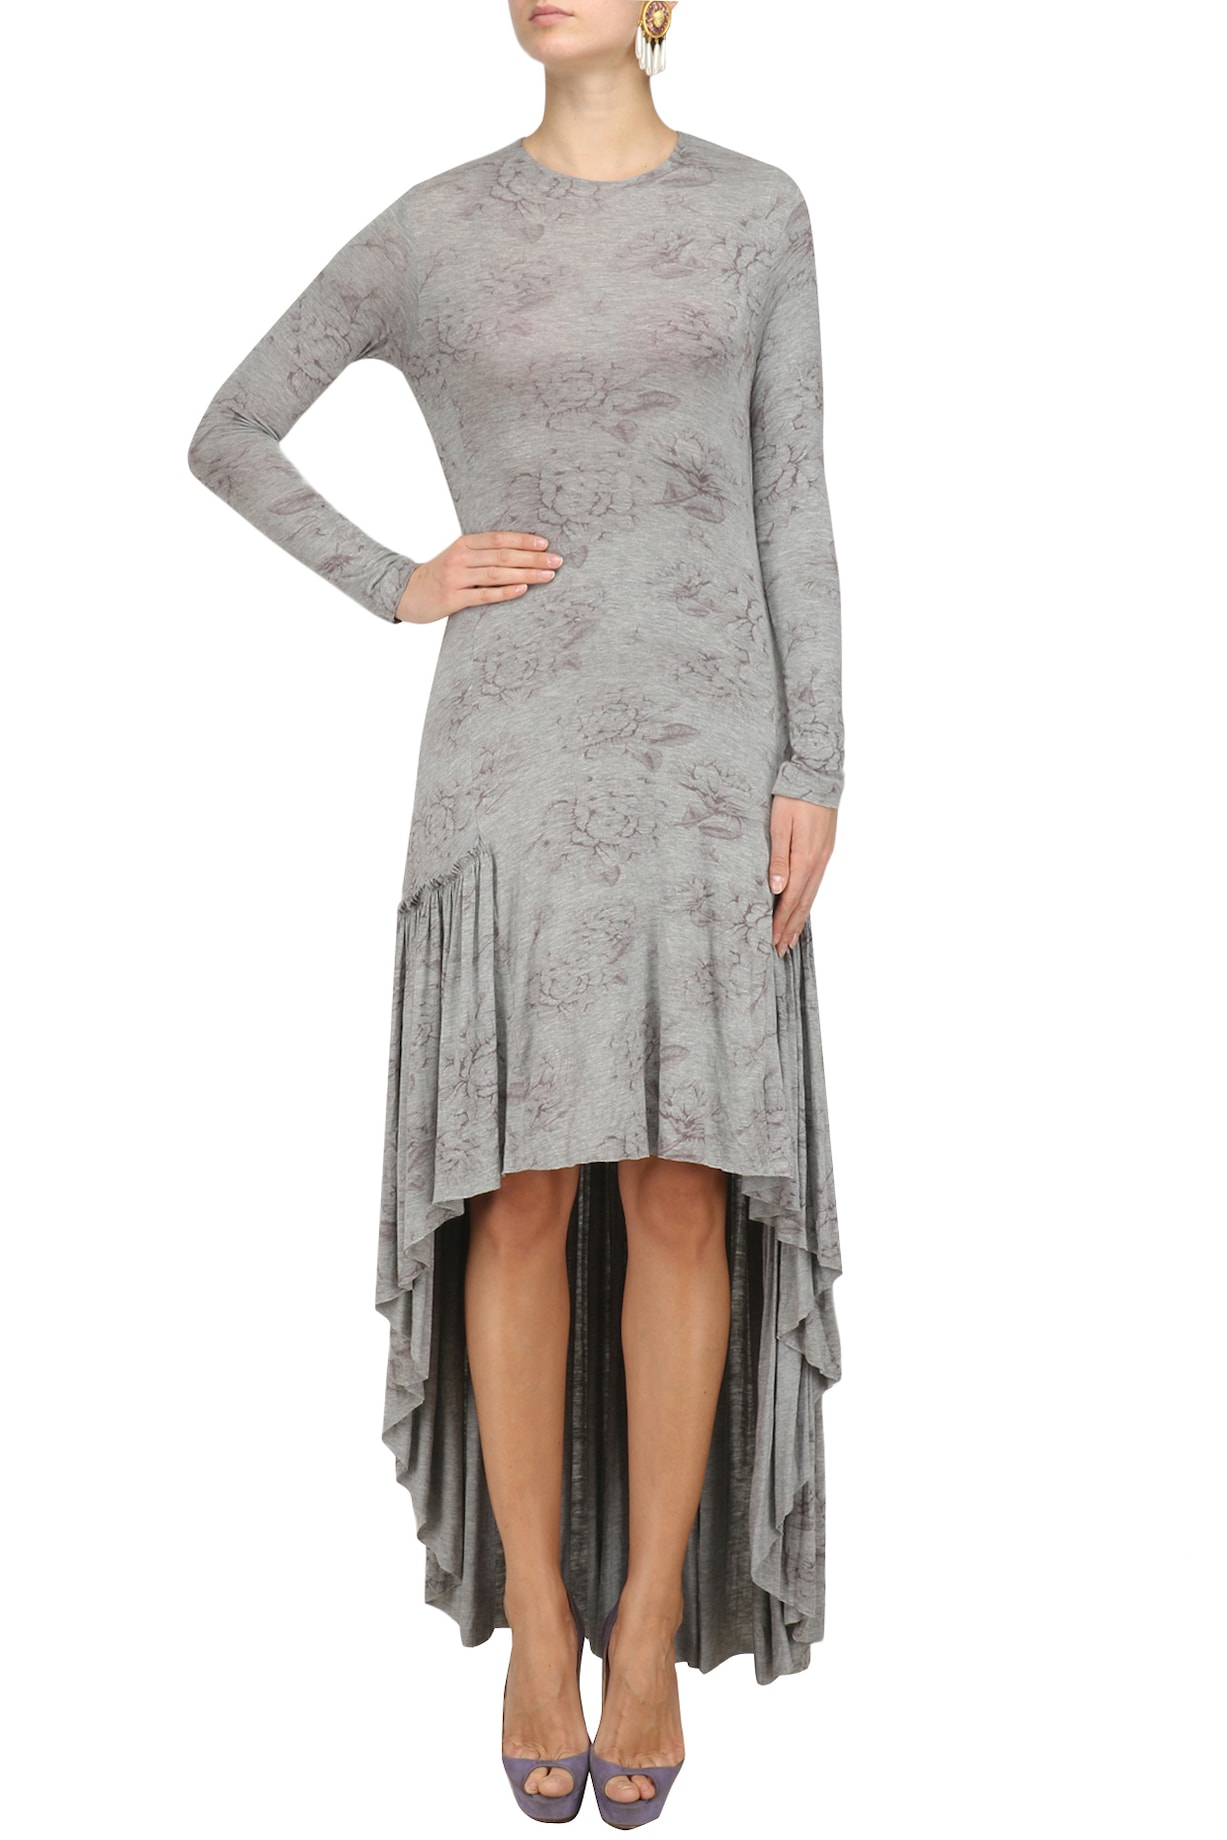 Nishka Lulla Dresses